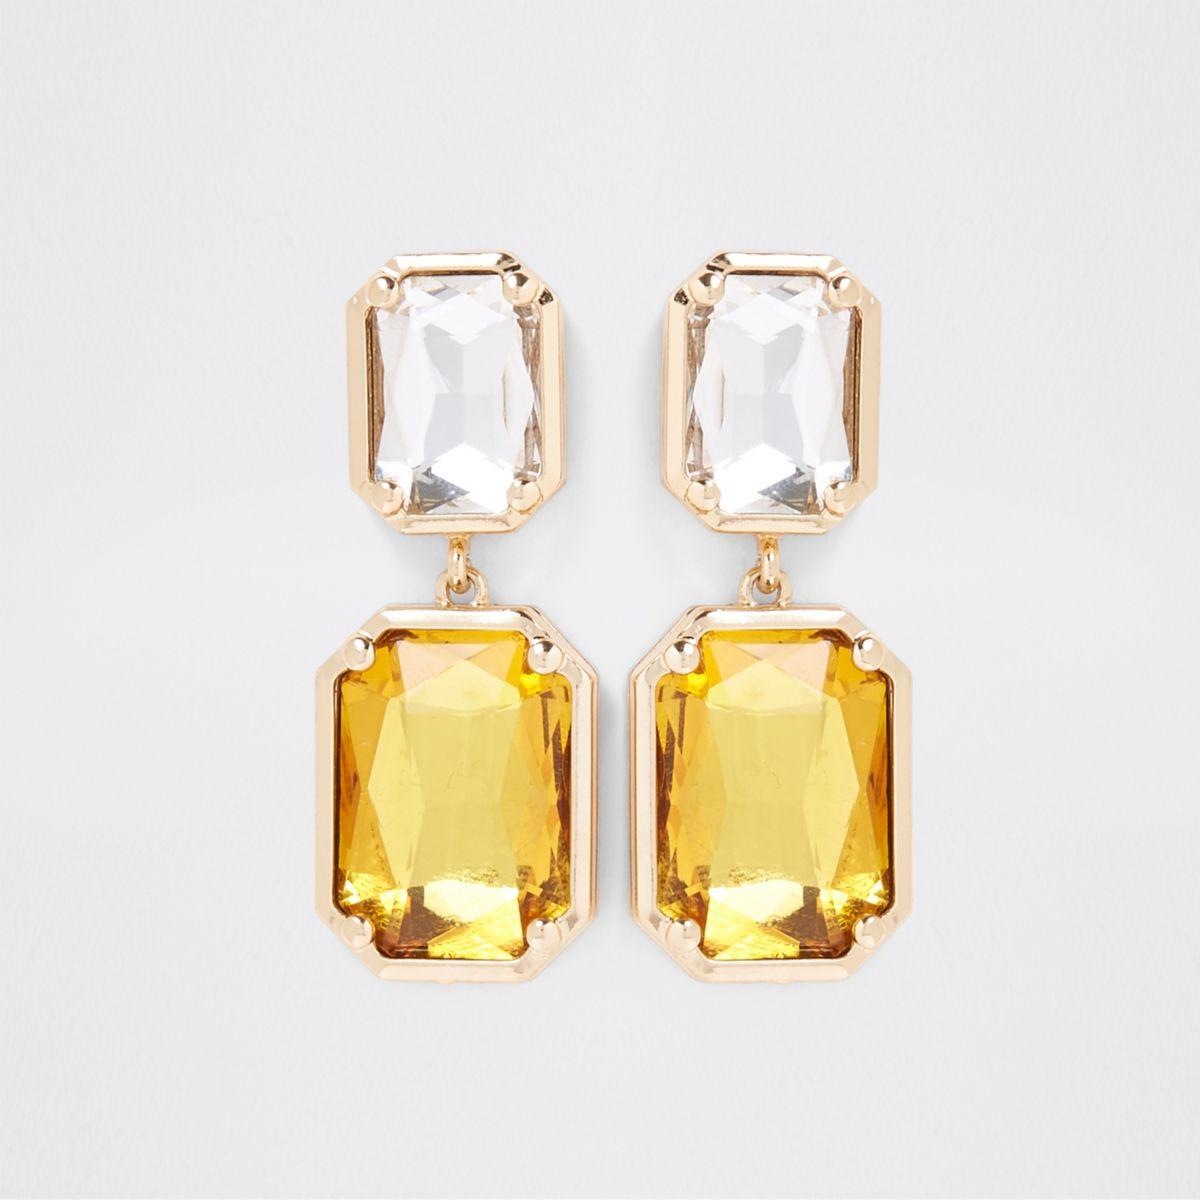 Gold tone amber crystal drop earrings